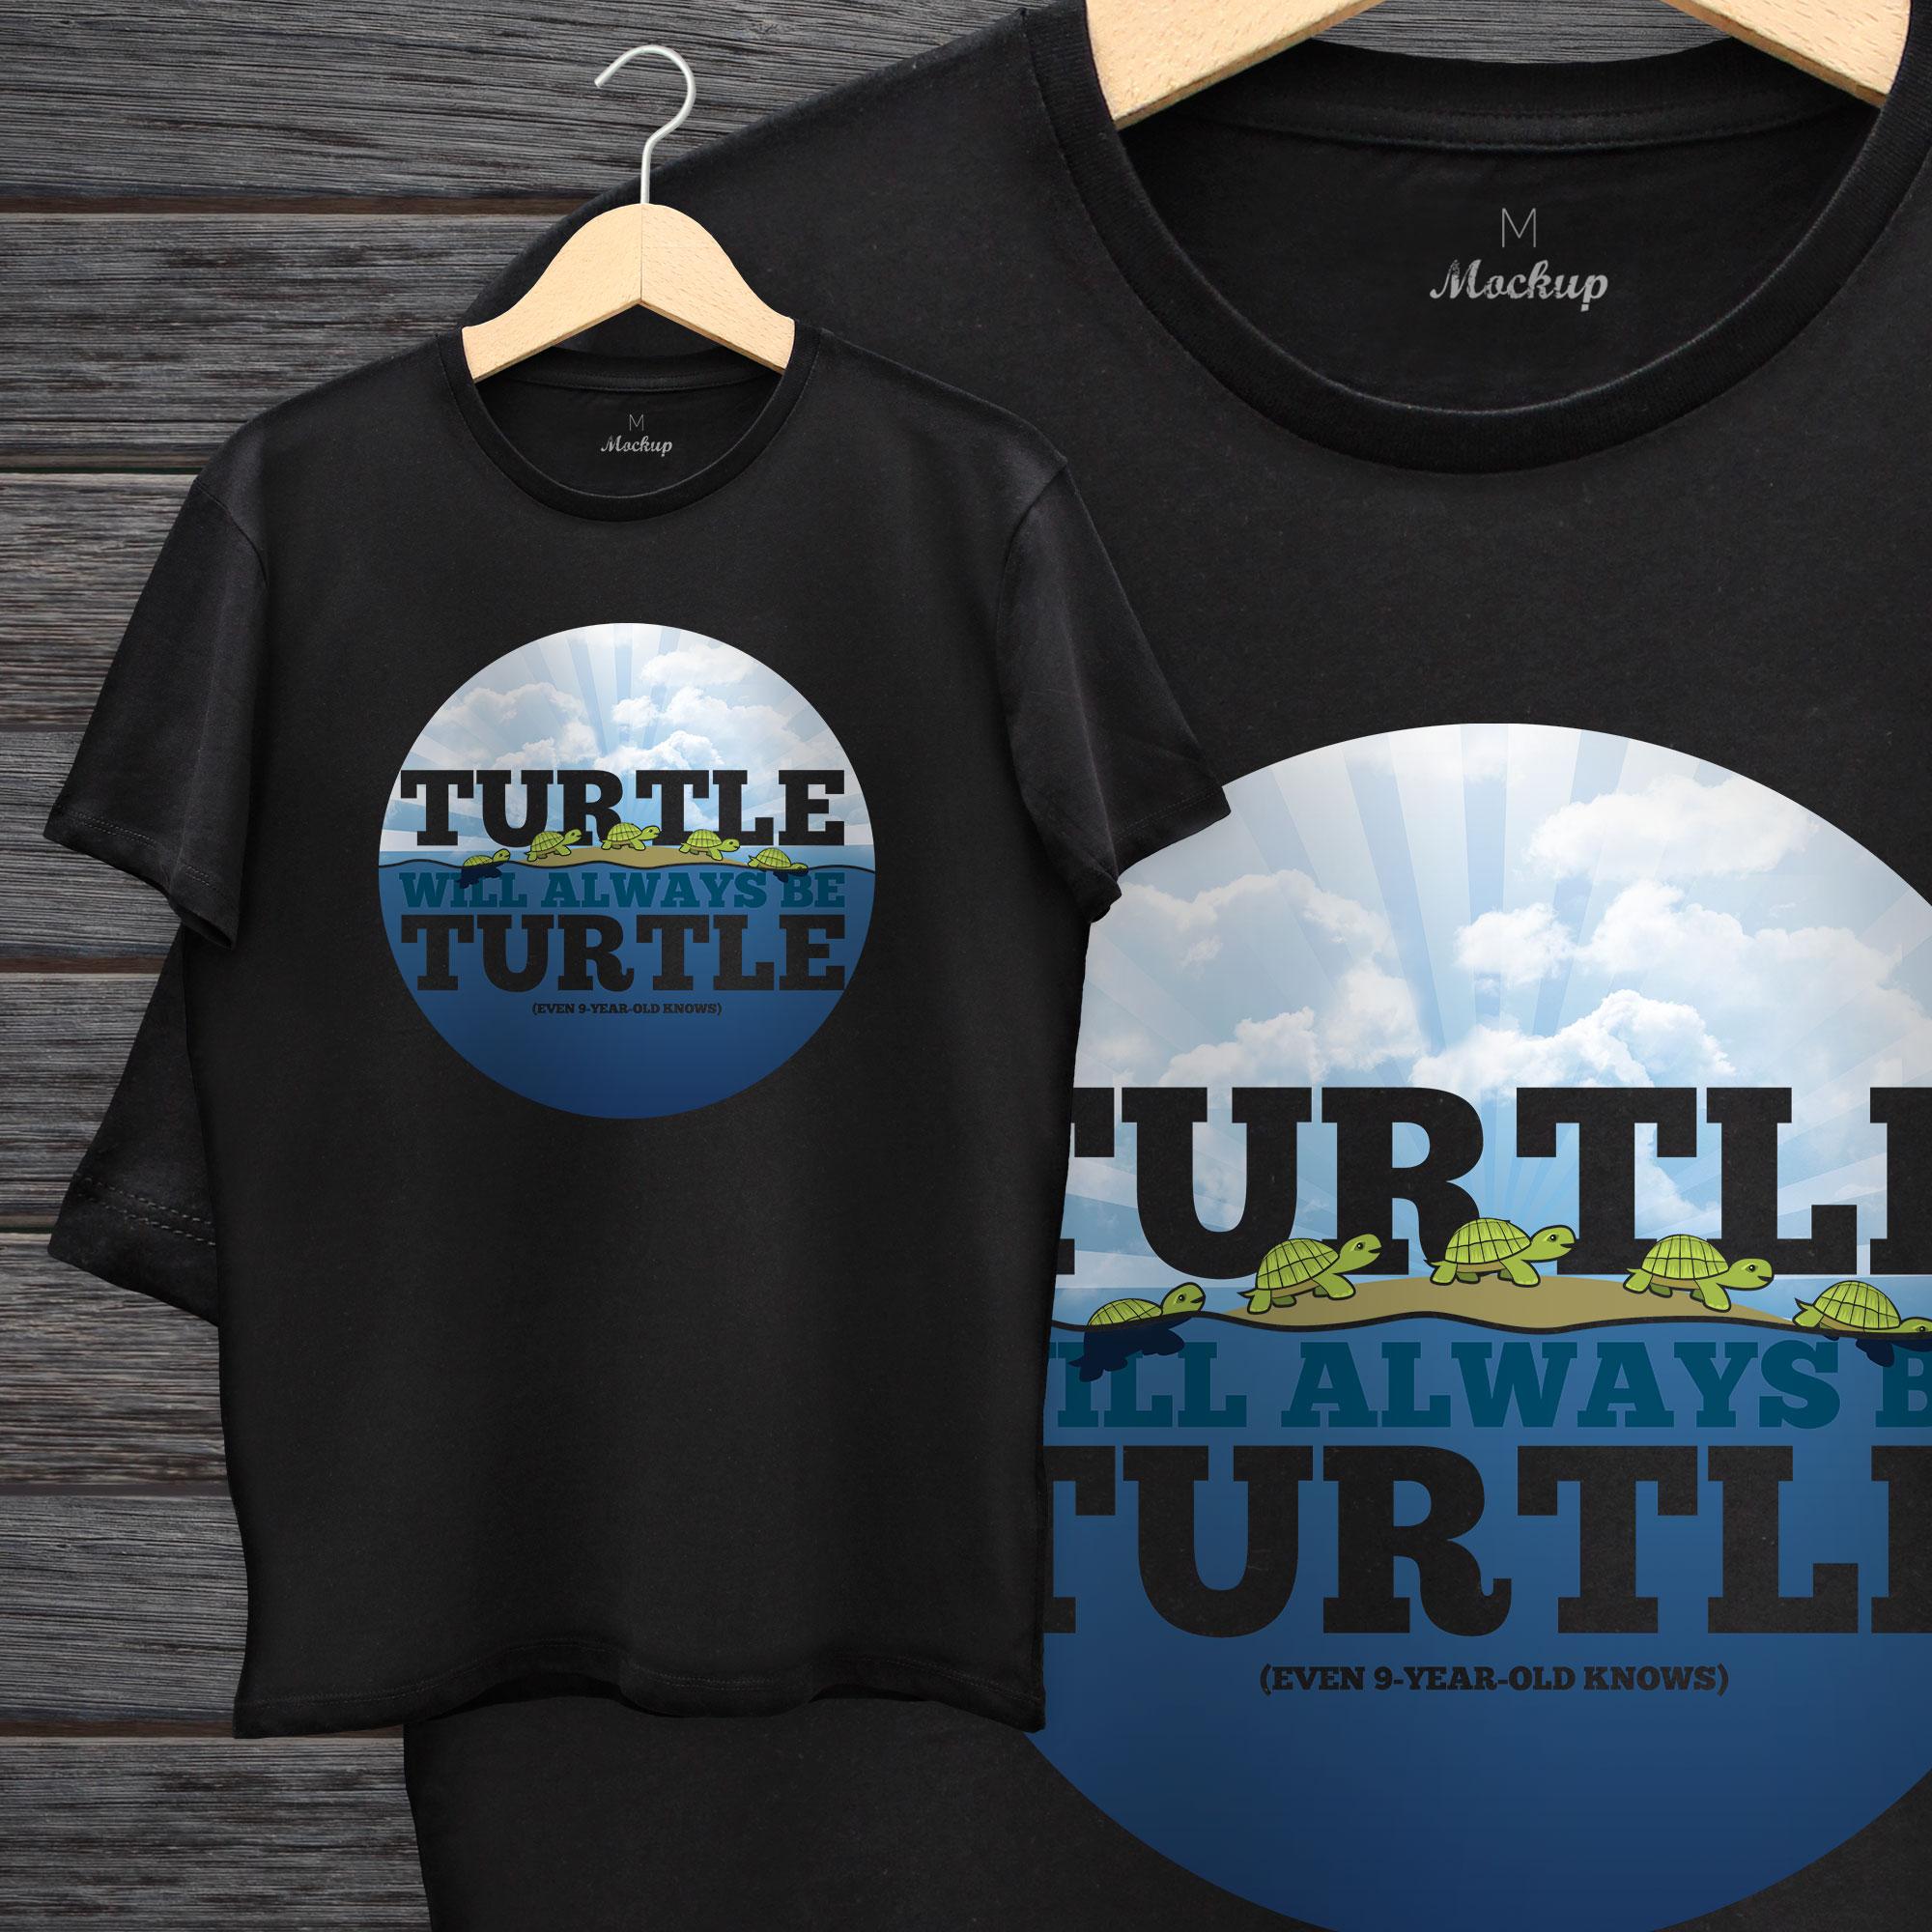 black-shirt-turtle.jpg